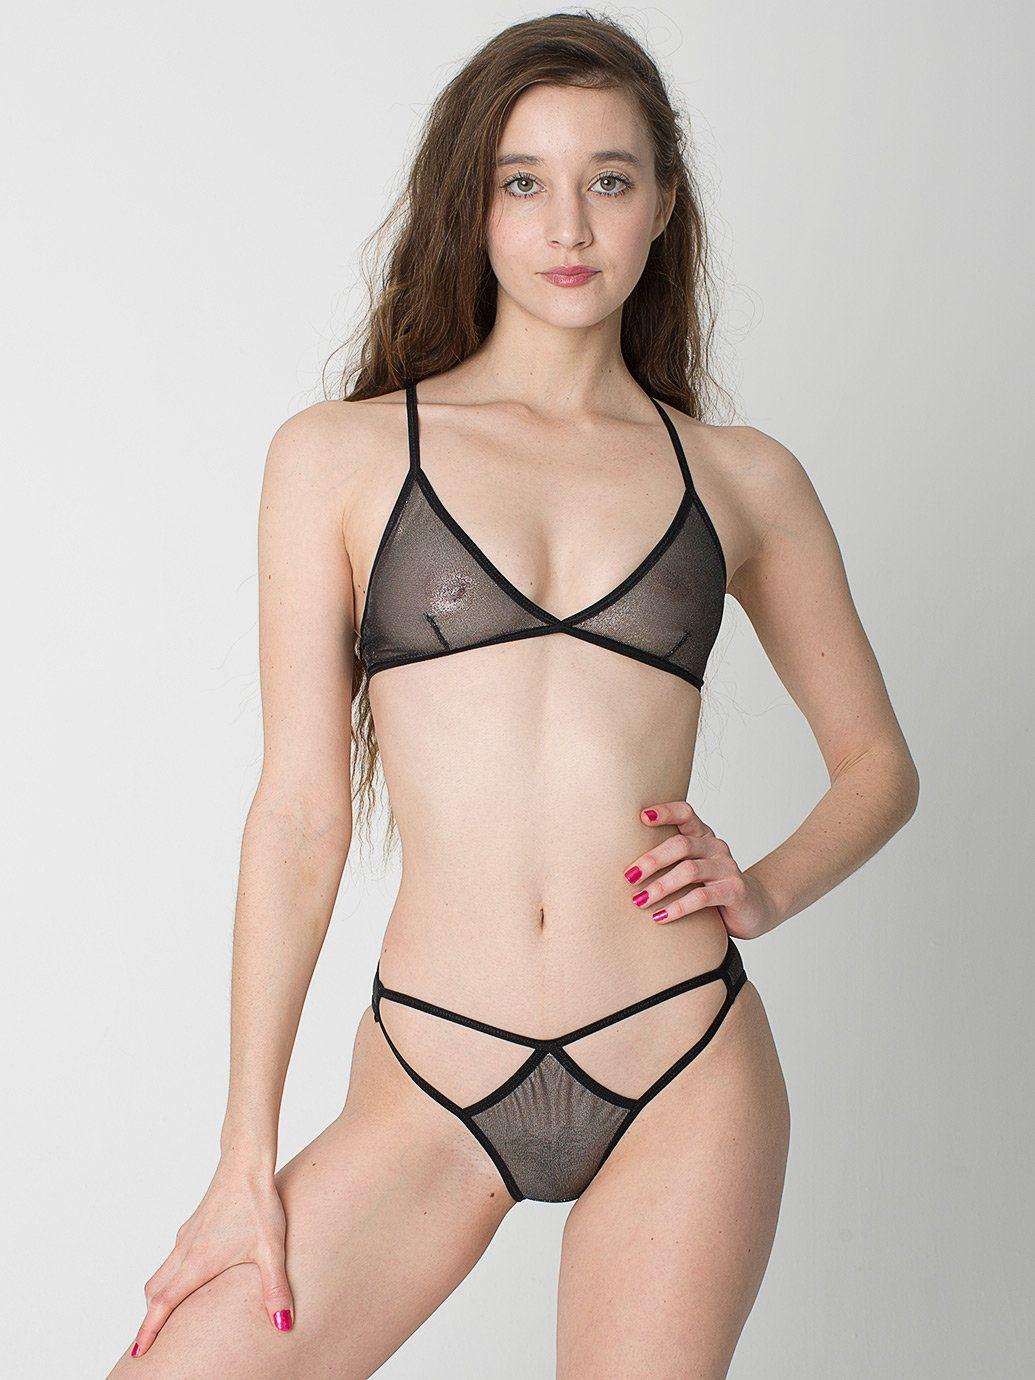 Shiny Mesh Cut Out Panty Sexxx Dreams Pinterest